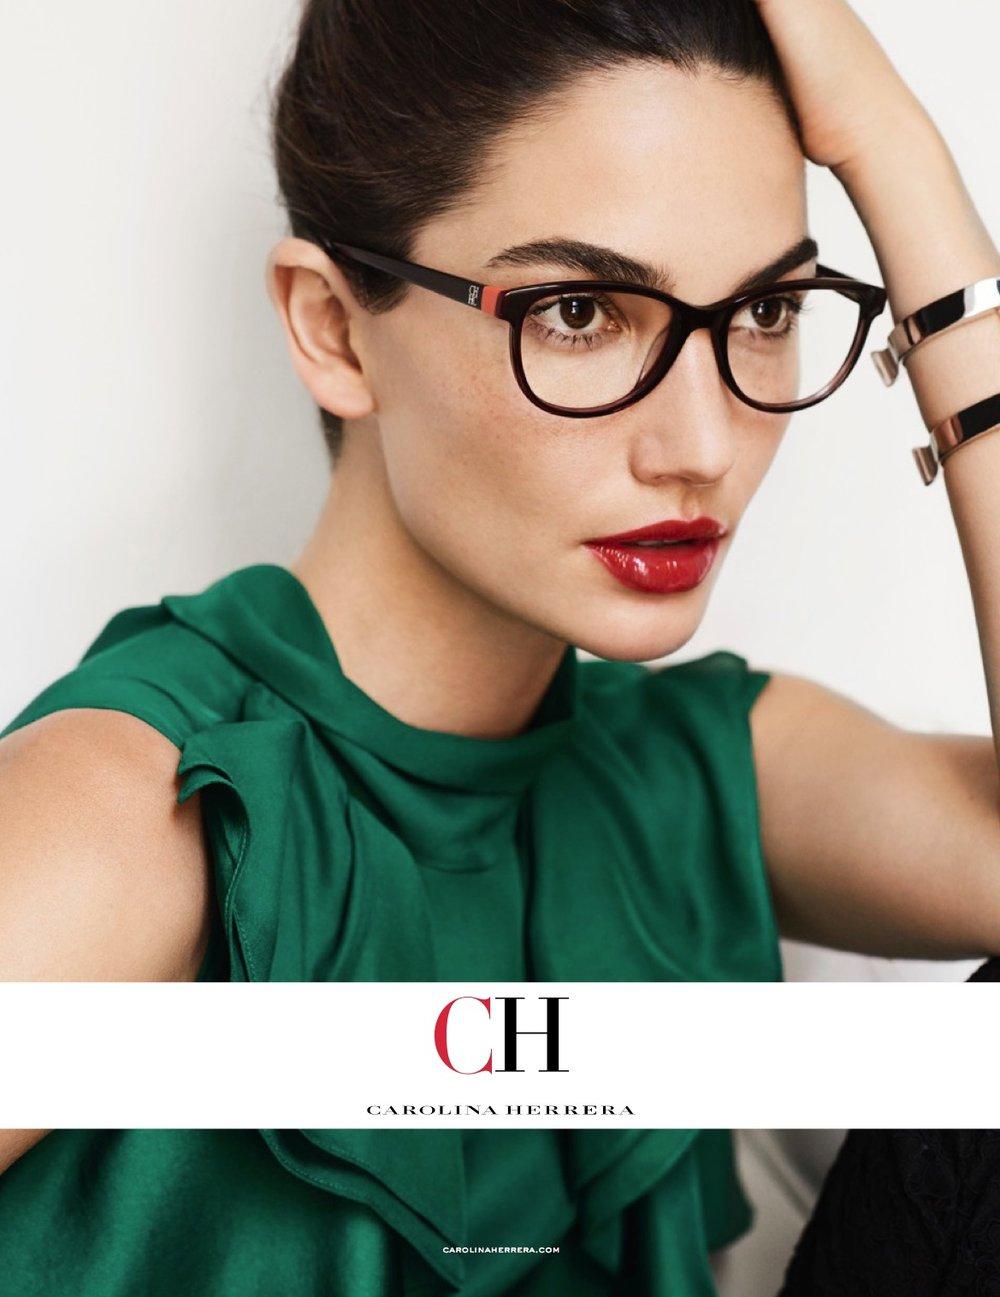 30% OFF Carolina Herrara - For a limited time, there is a massive 30% off all our Carolina Herrara frames!